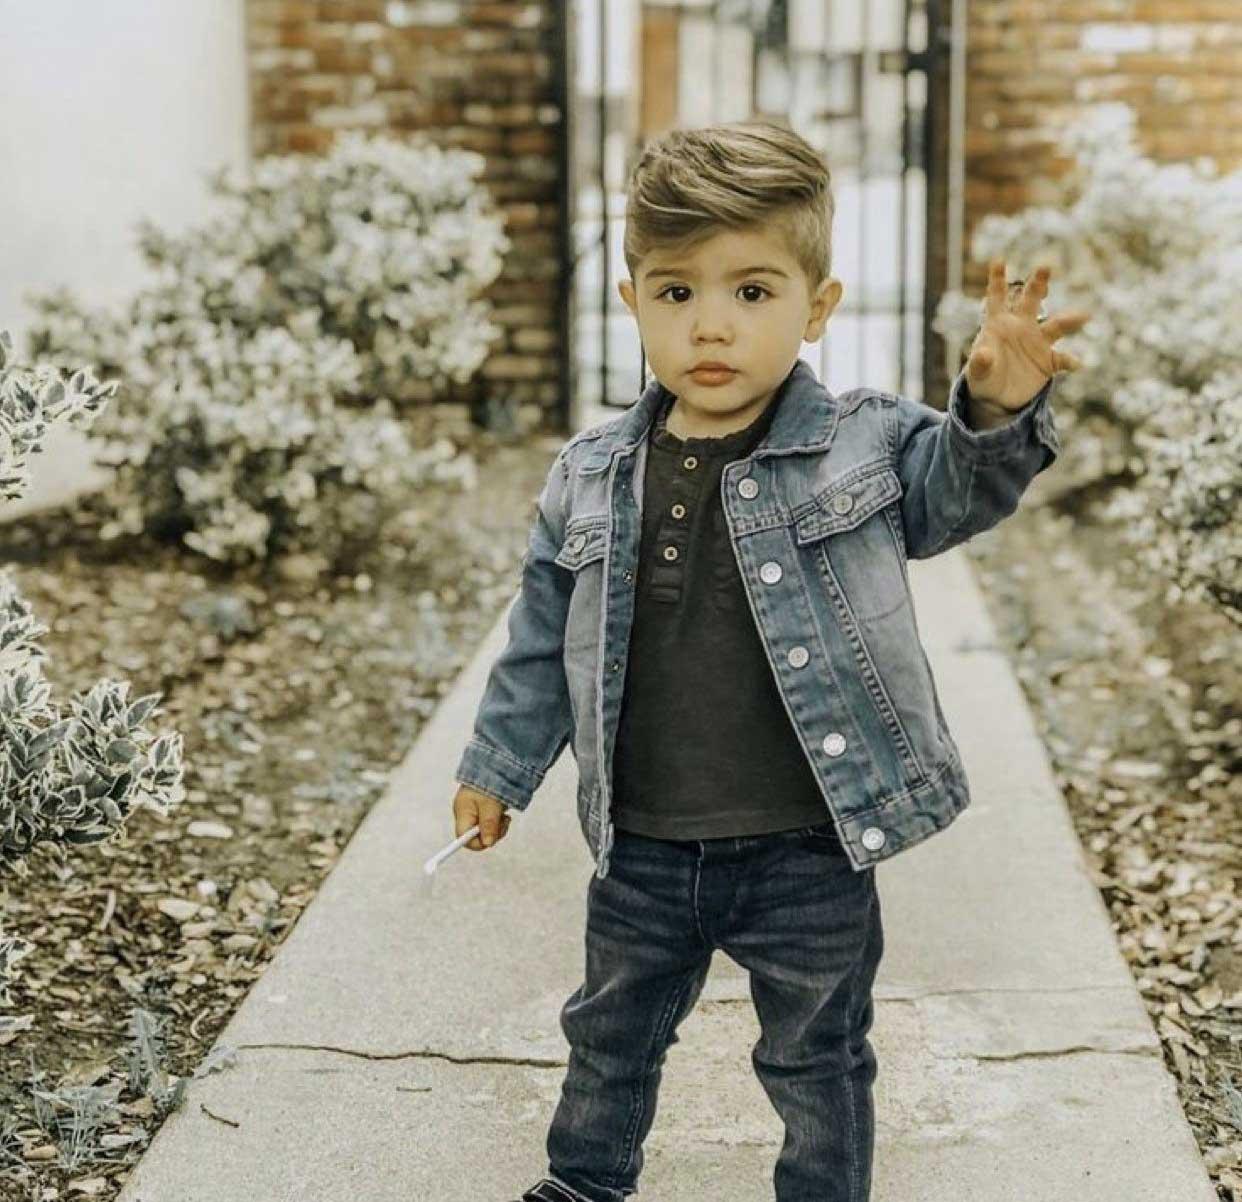 Cute Baby Boys Whatsapp DP Images Photo